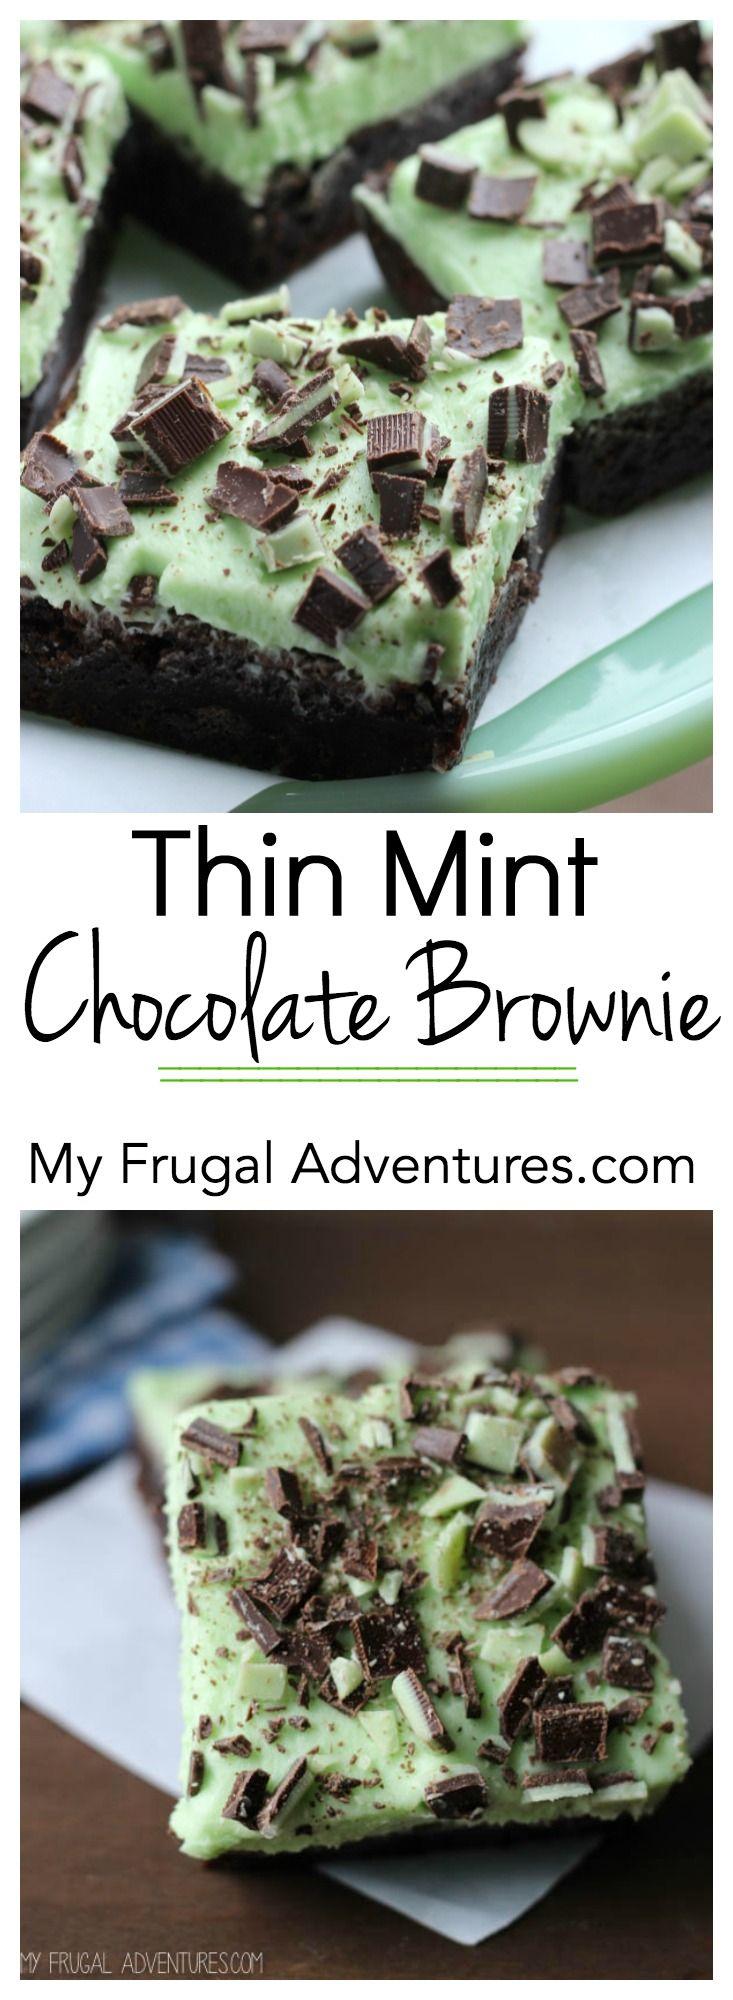 Thin Mint Chocolate Brownie Recipe